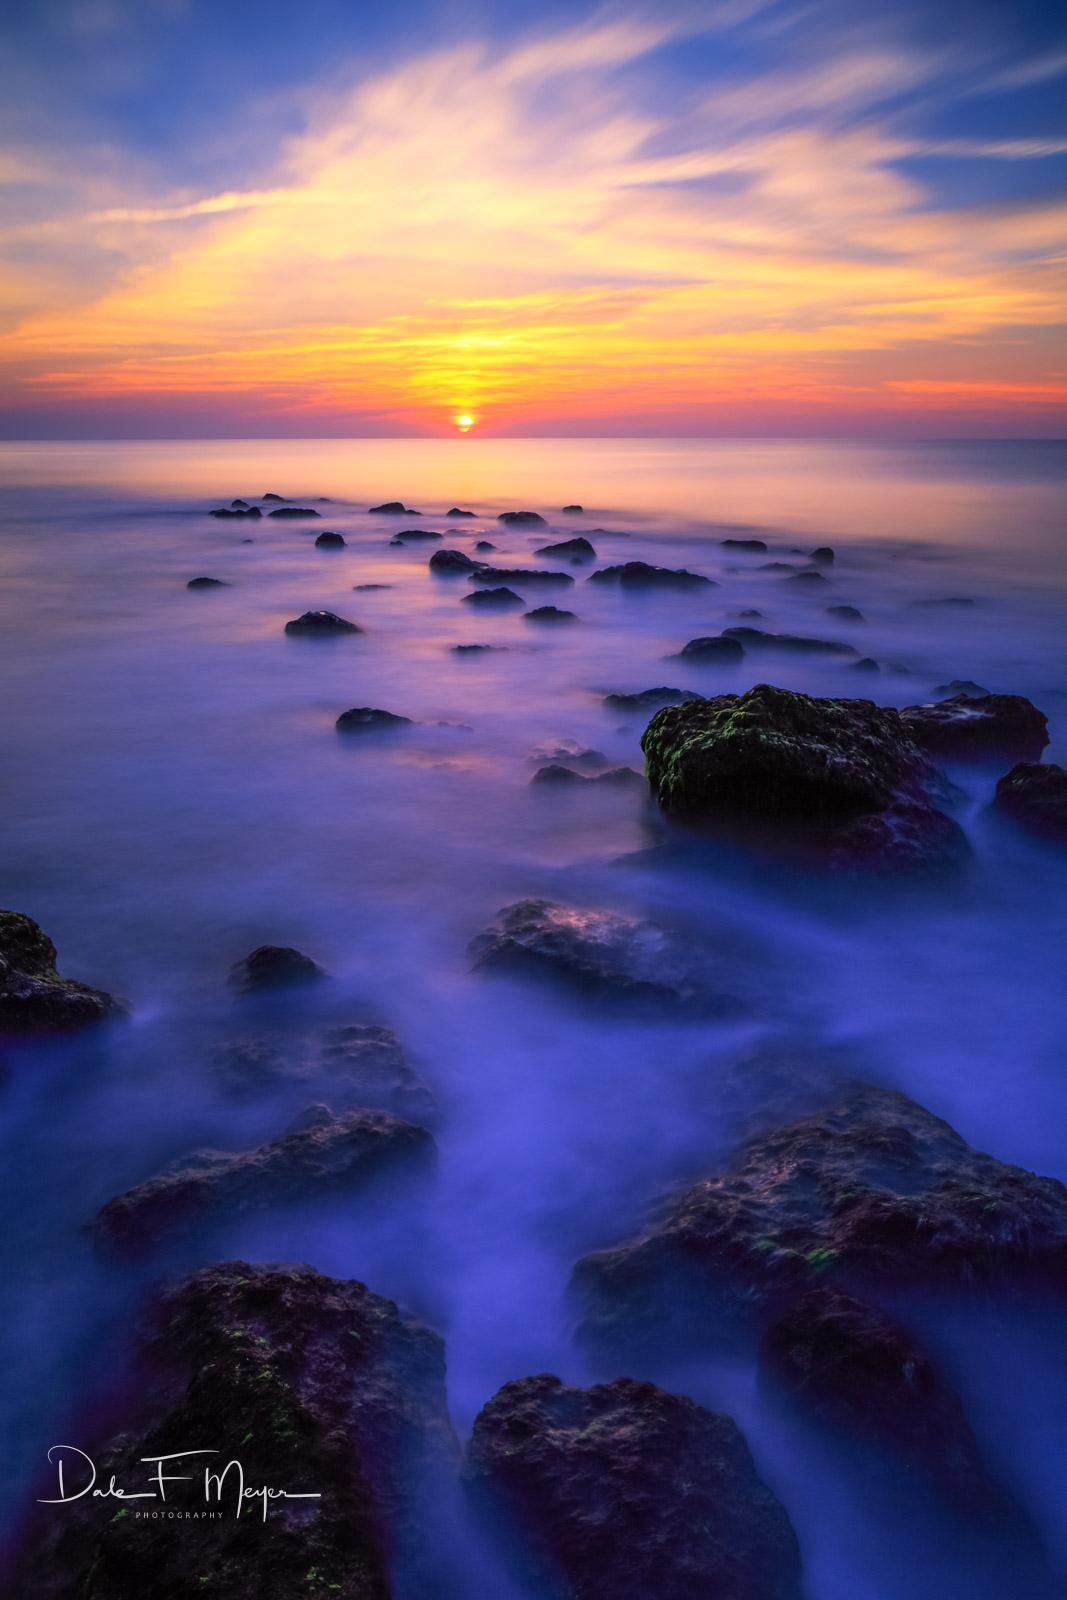 Carolina Beach, Coastal Photos from the Eastern Seaboard Gallery, long exposure, North Carolina, ocean, Old Stone Jetty, sunrise, photo